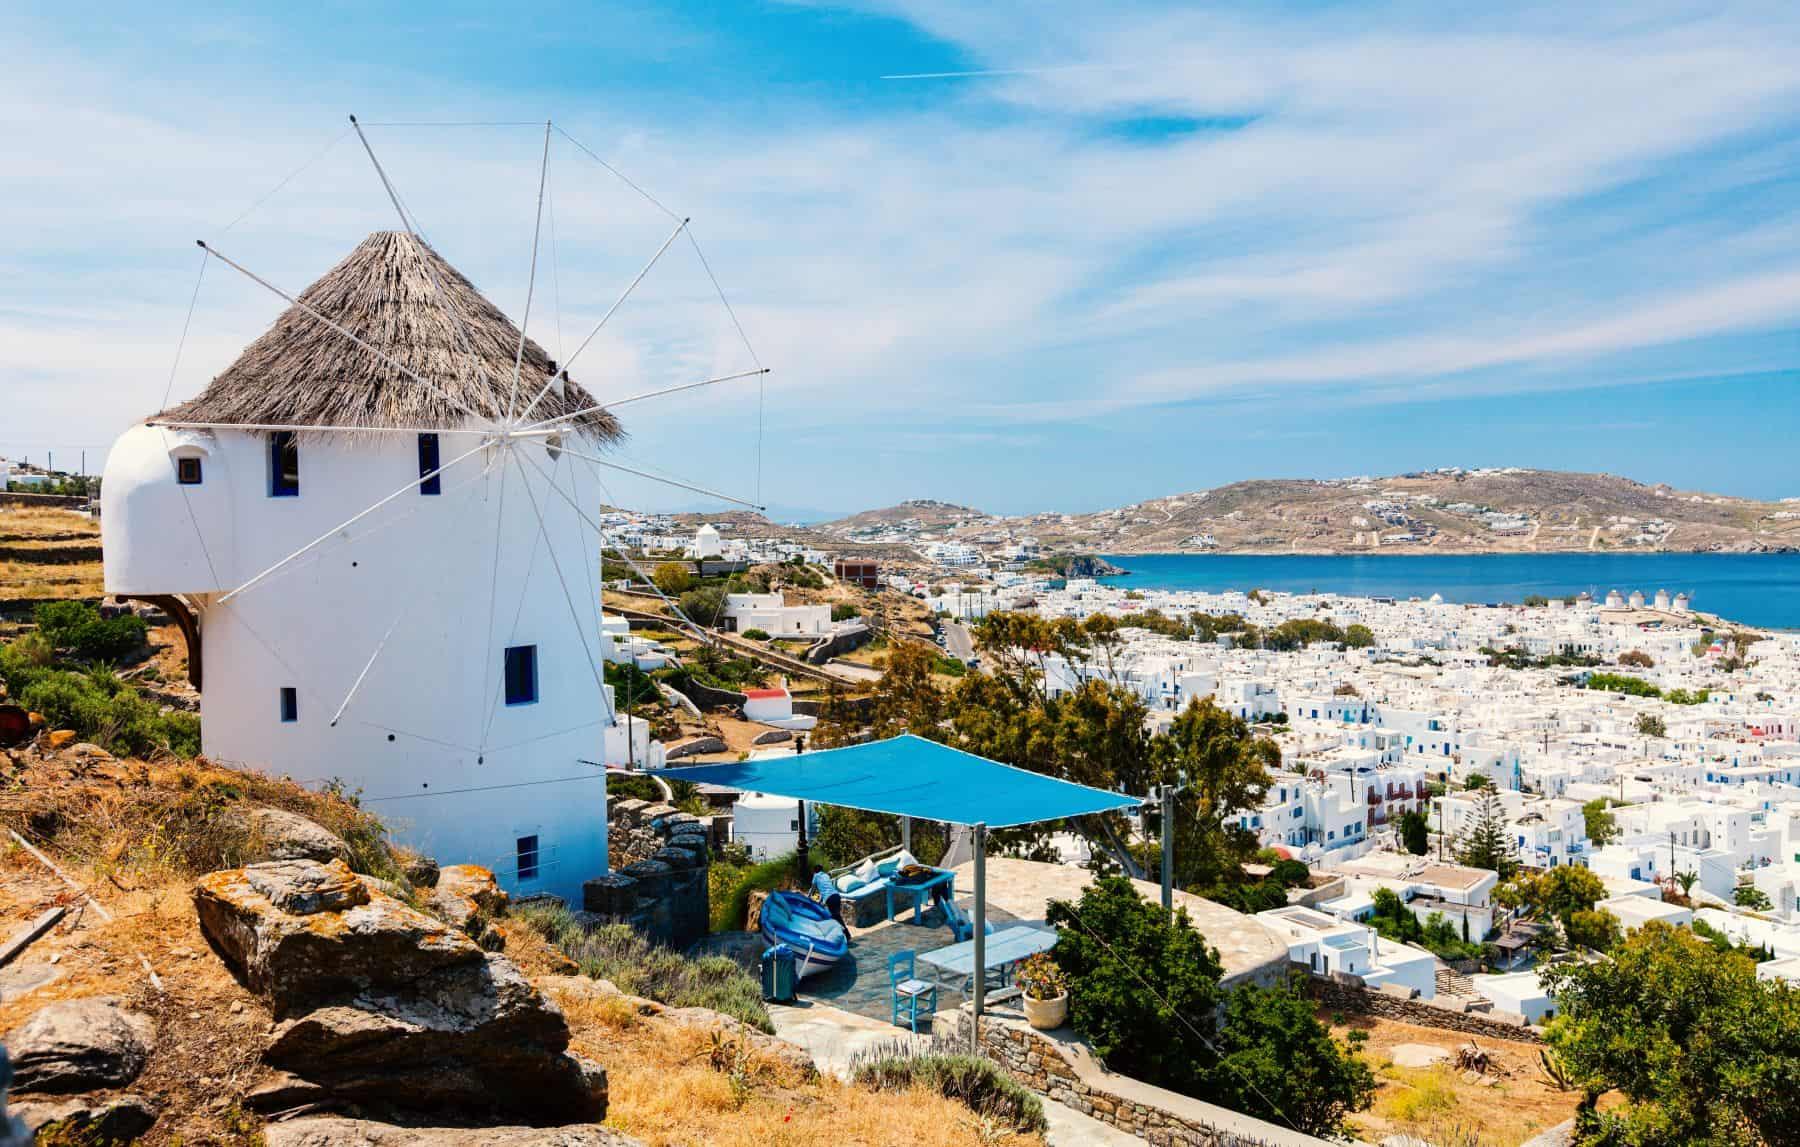 Cât de bine cunoști Grecia